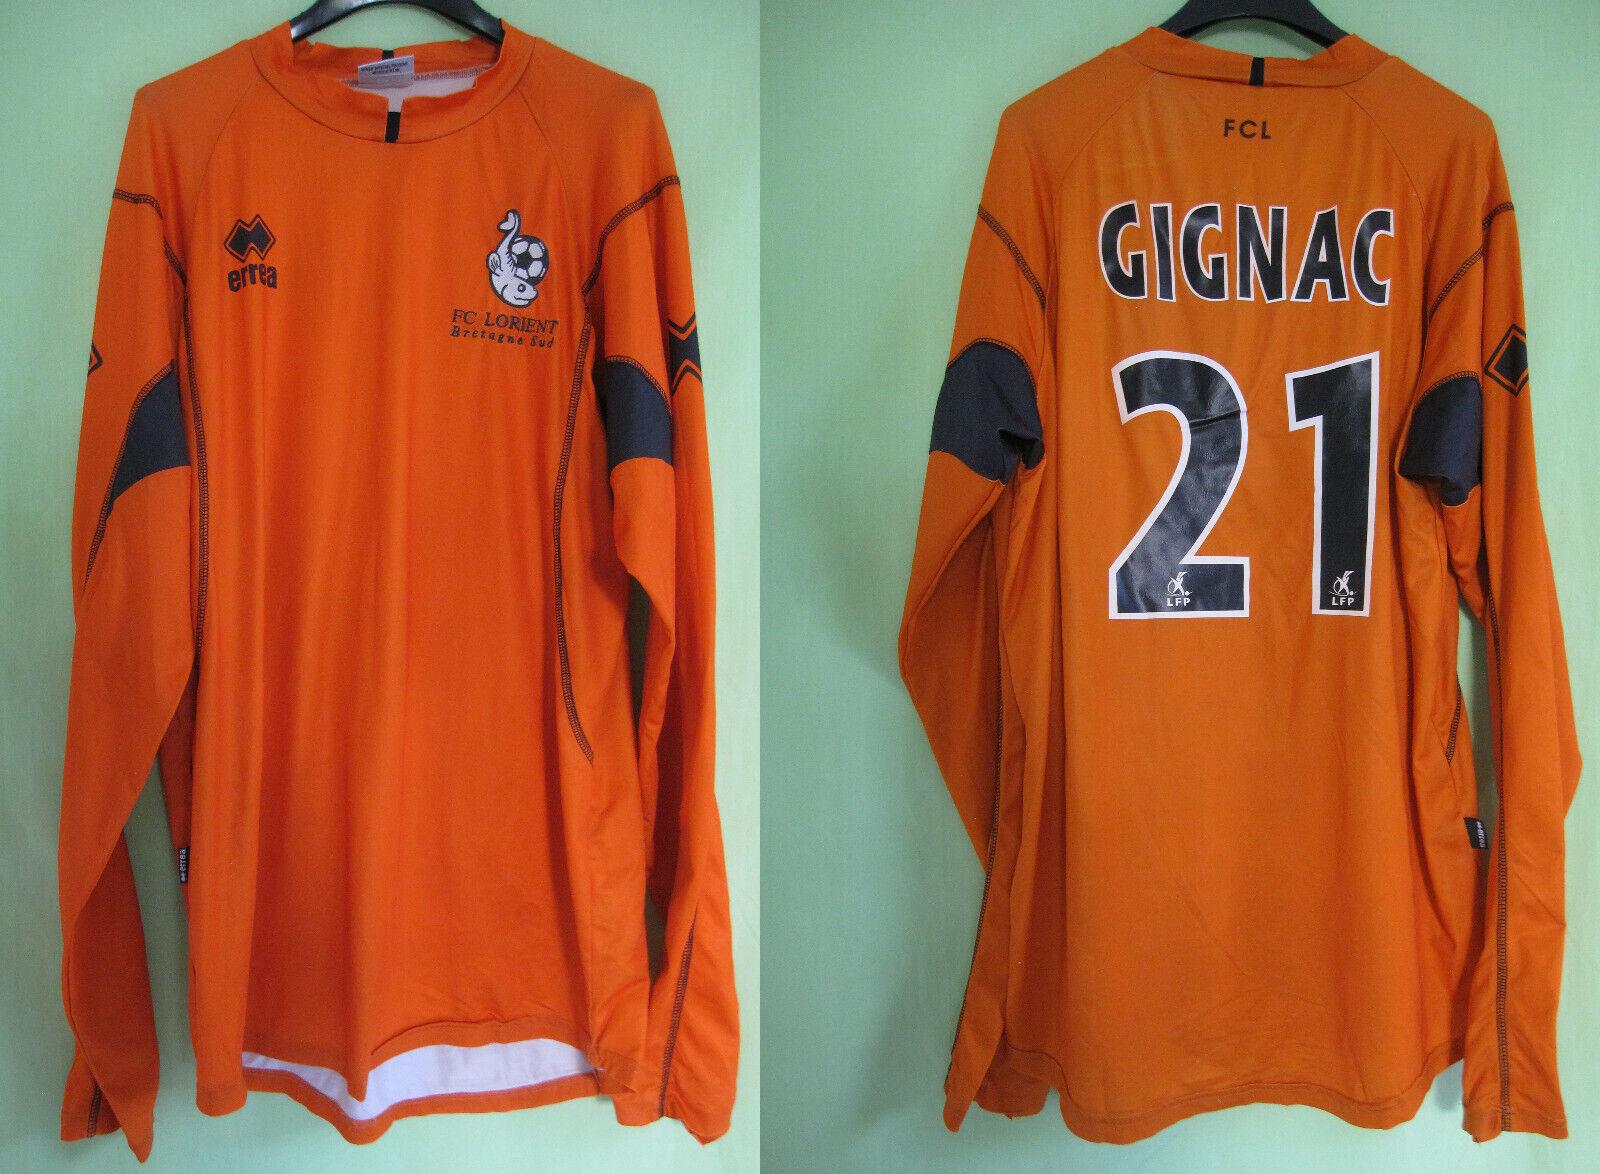 Maillot FC Lorient Gignac  21 Errea arancia uomoche lungoue Vintage Jersey  L